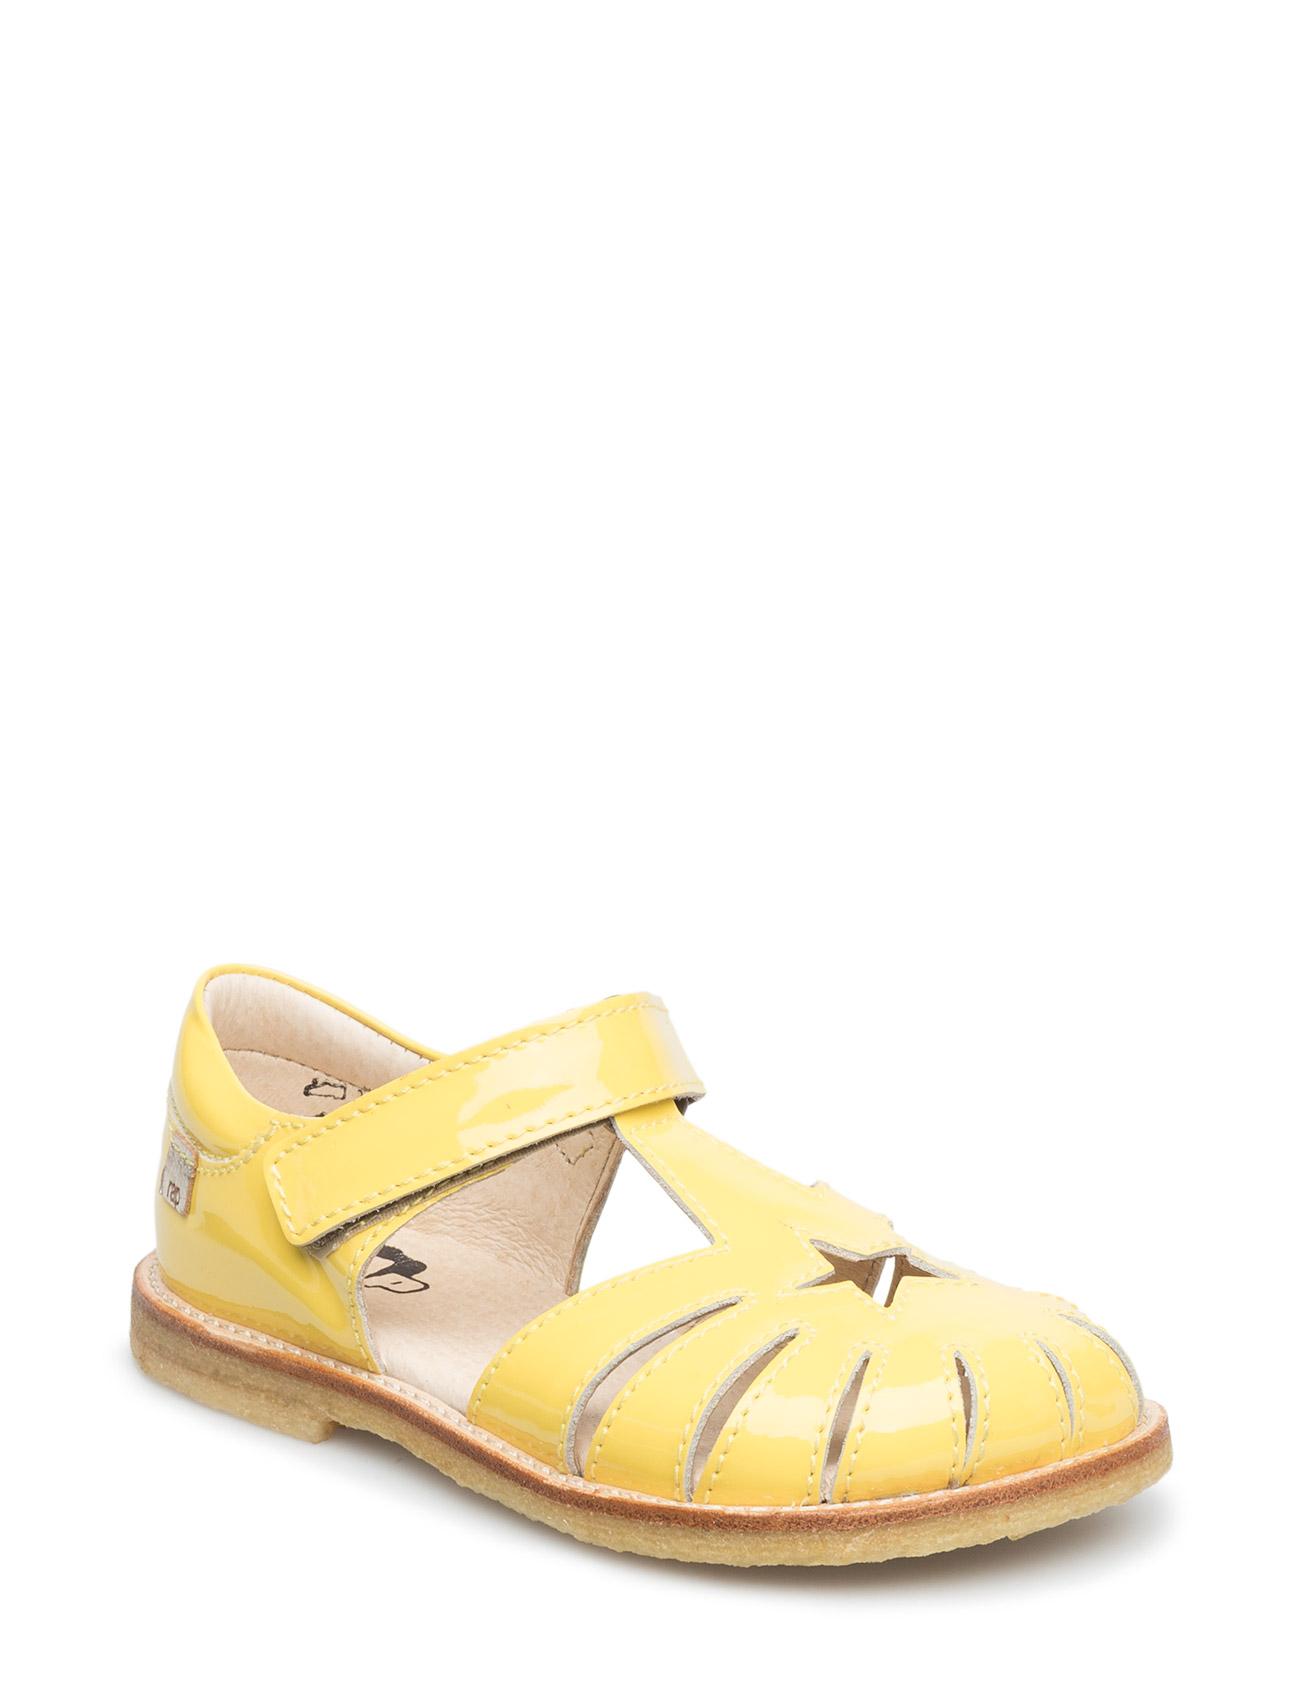 fef44ba91e4c Arauto RAP - Tøj   sko fra alle fashionsites ét sted